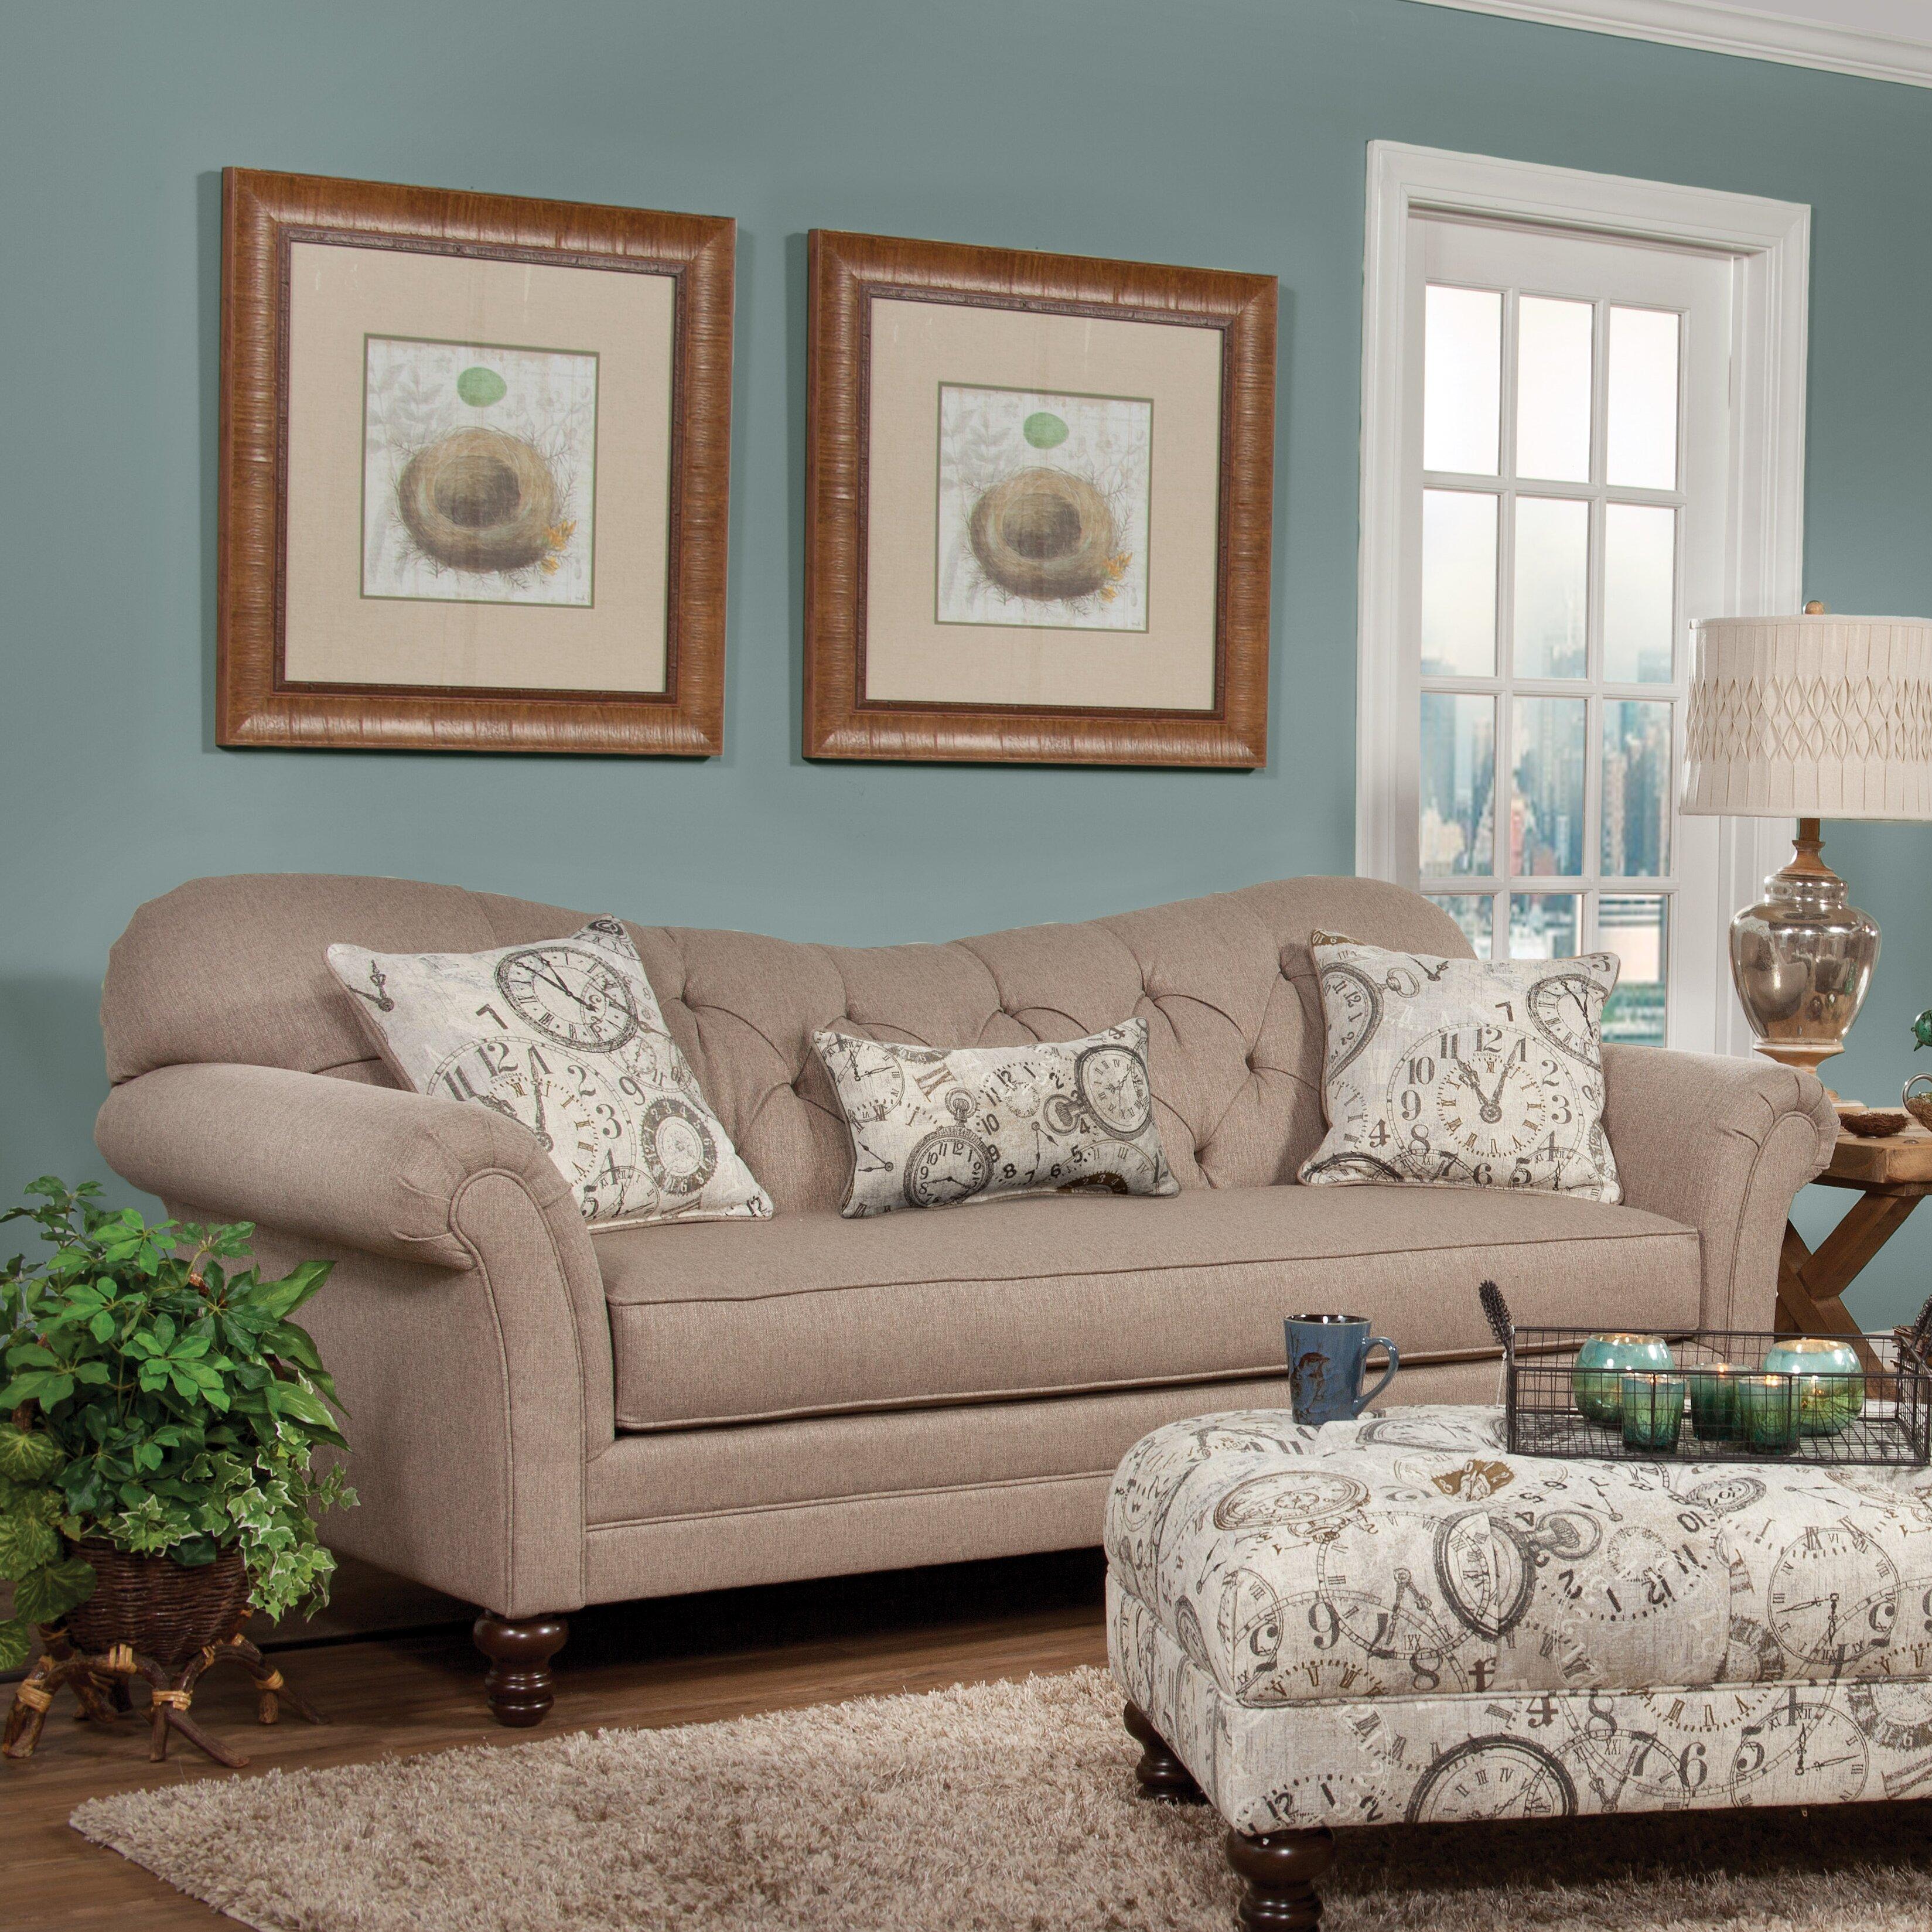 Three Posts Serta Upholstery Wheatfield Sofa & Reviews | Wayfair